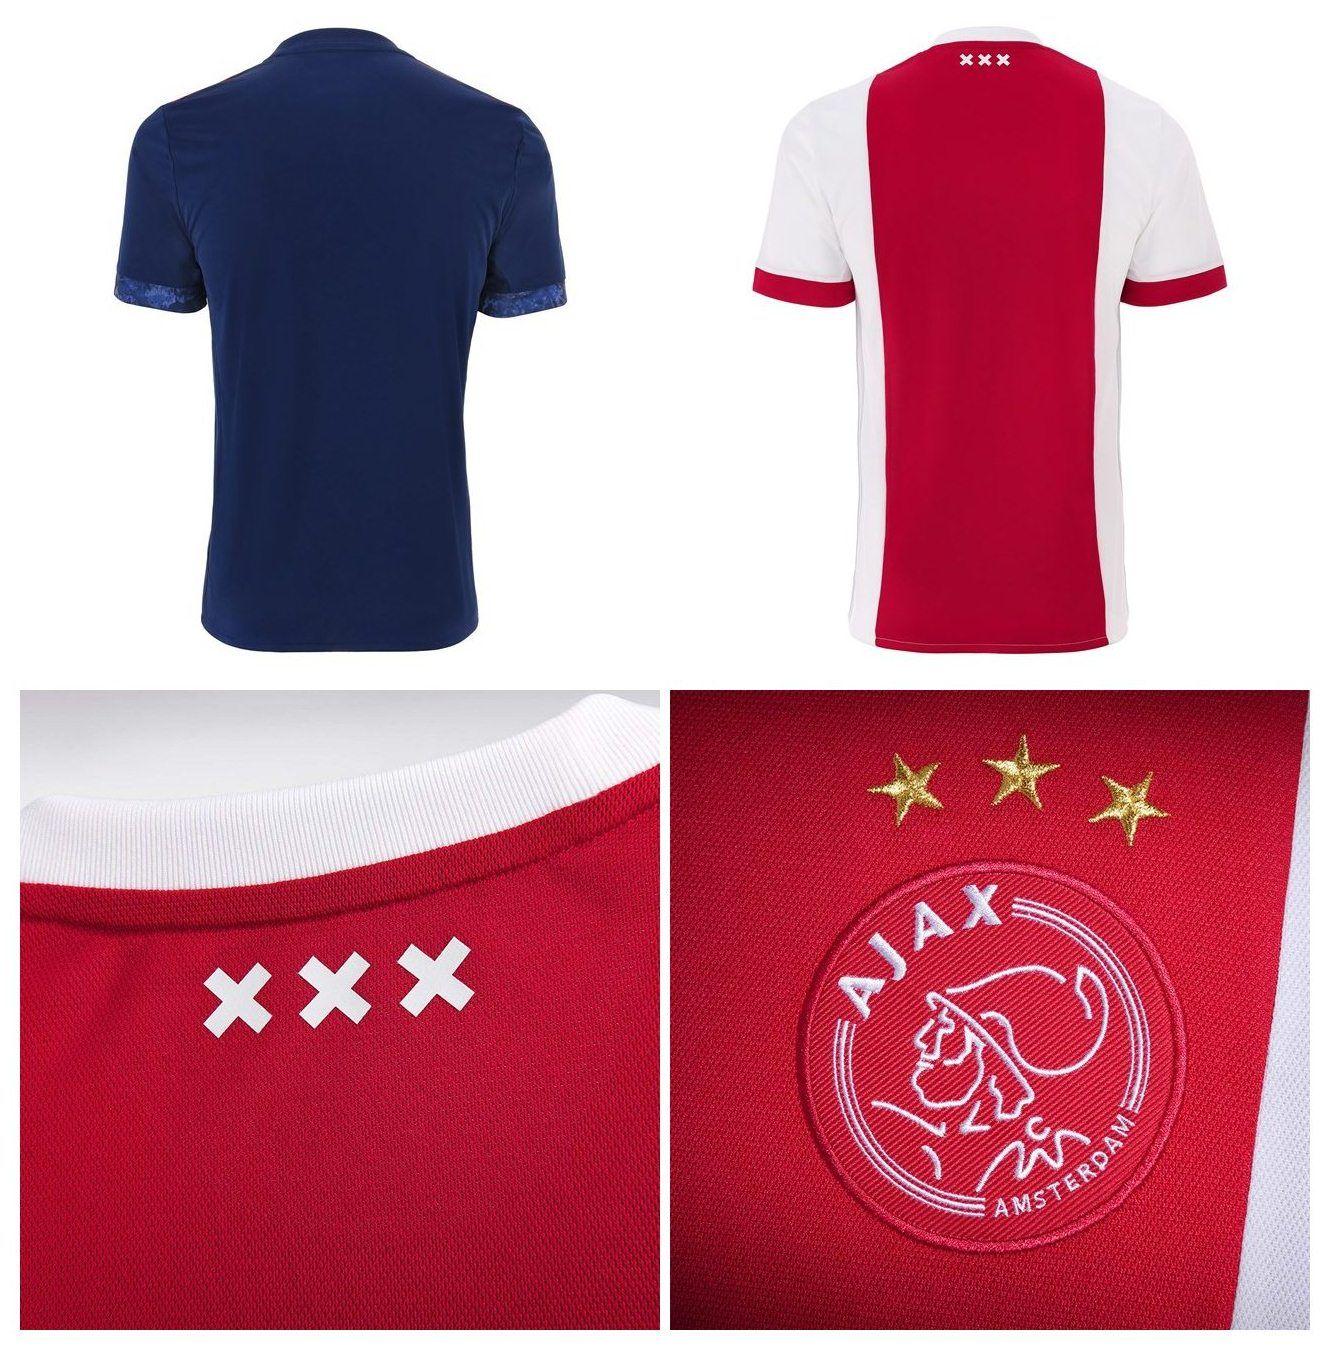 52bdf8d69 ... whosales ajax 2017 amsterdam soccer jerseys afc ajax 2018 jersey  football jersey uniforms 17 18 discount